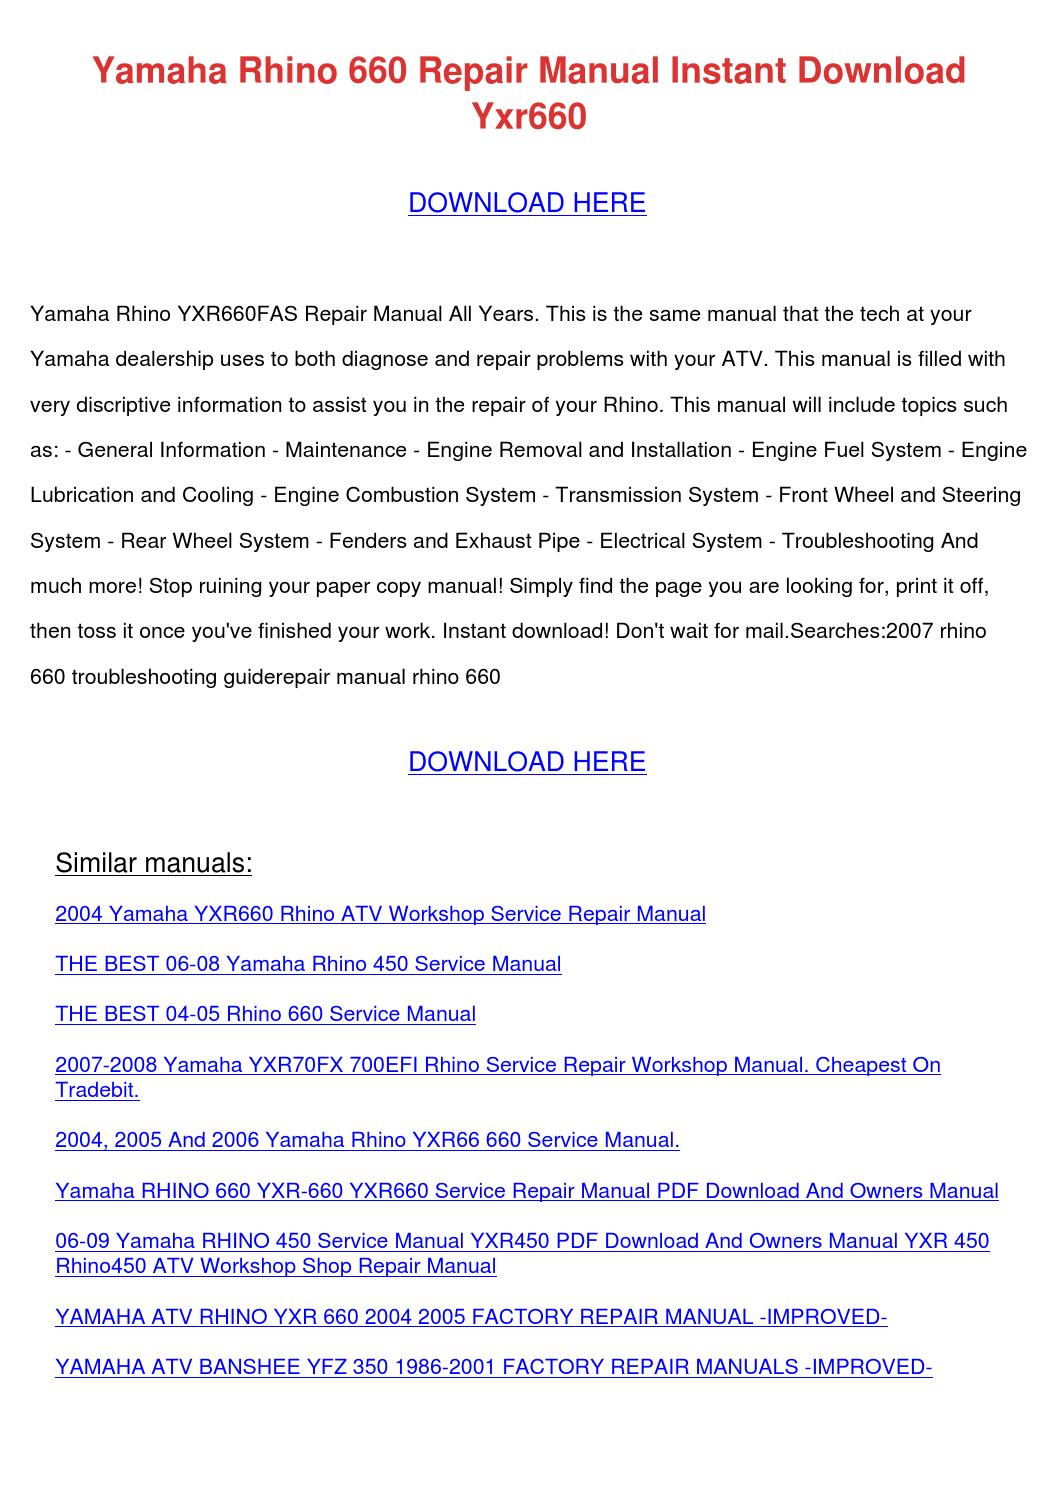 Yamaha Rhino 660 Repair Manual Instant Downlo by ShanonSamples - issuu